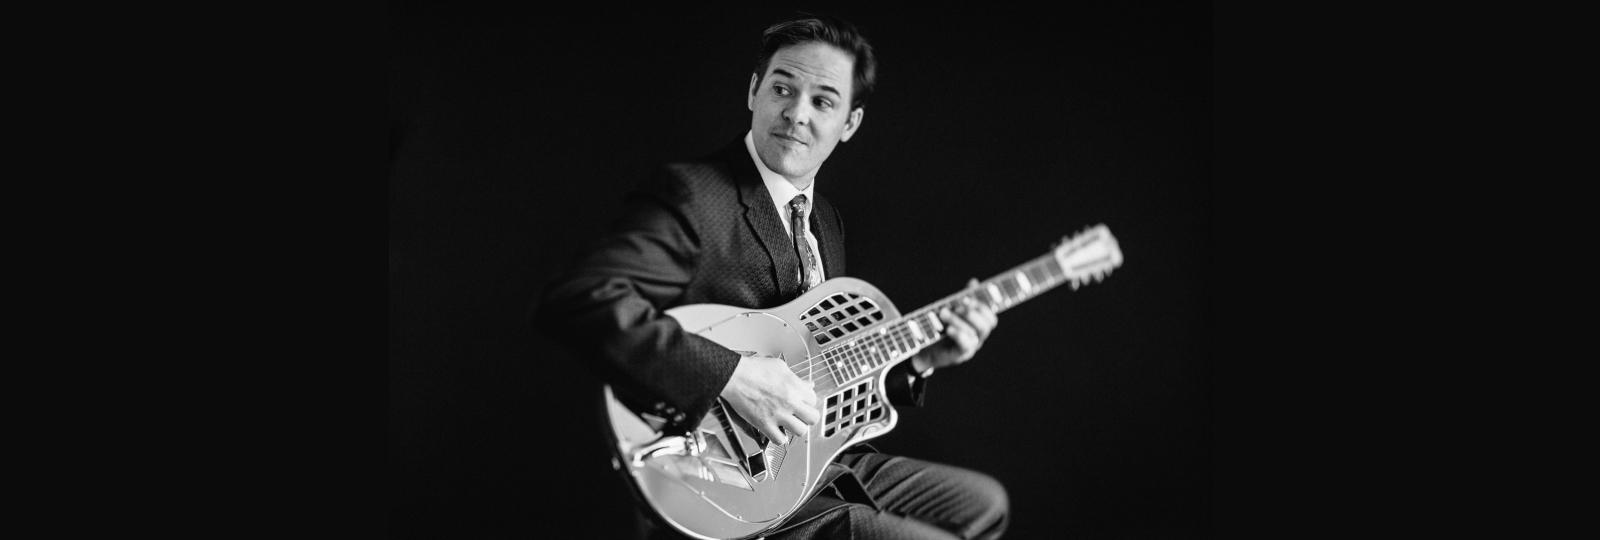 Greg Ruby Music